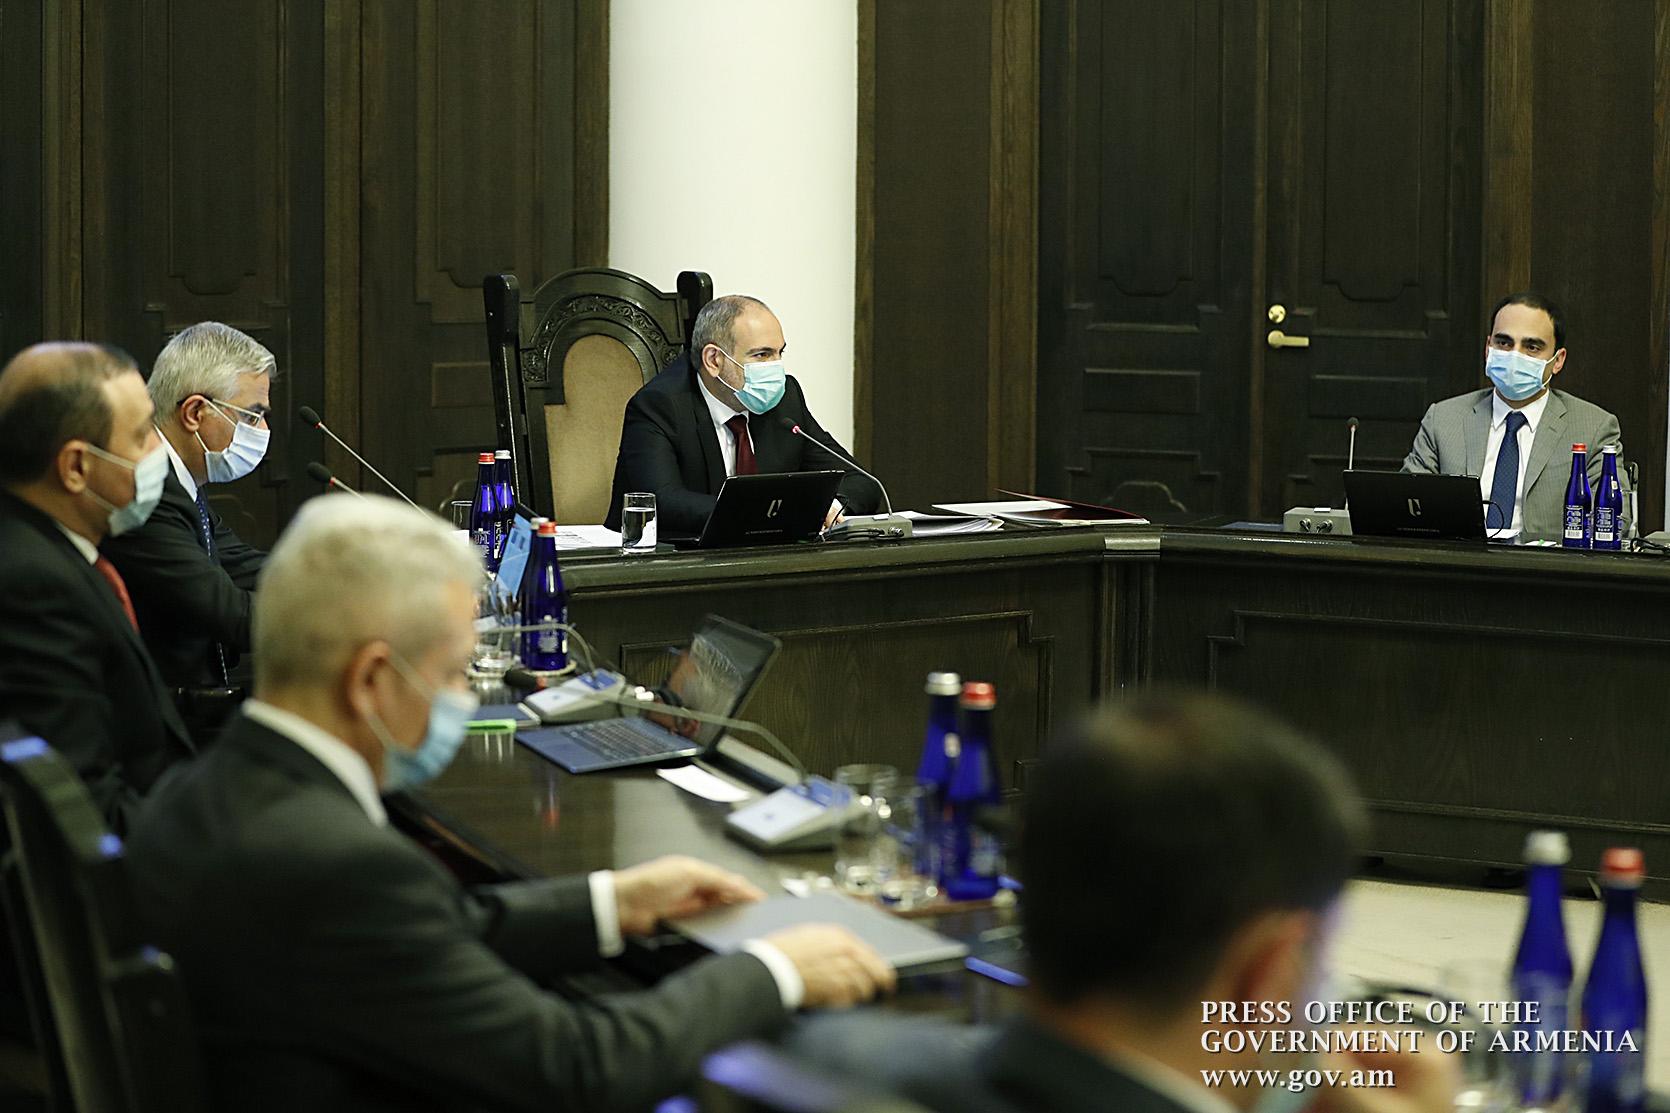 Photo of Премьер-министр Армении обеспокоен обострением ситуации с COVID-19